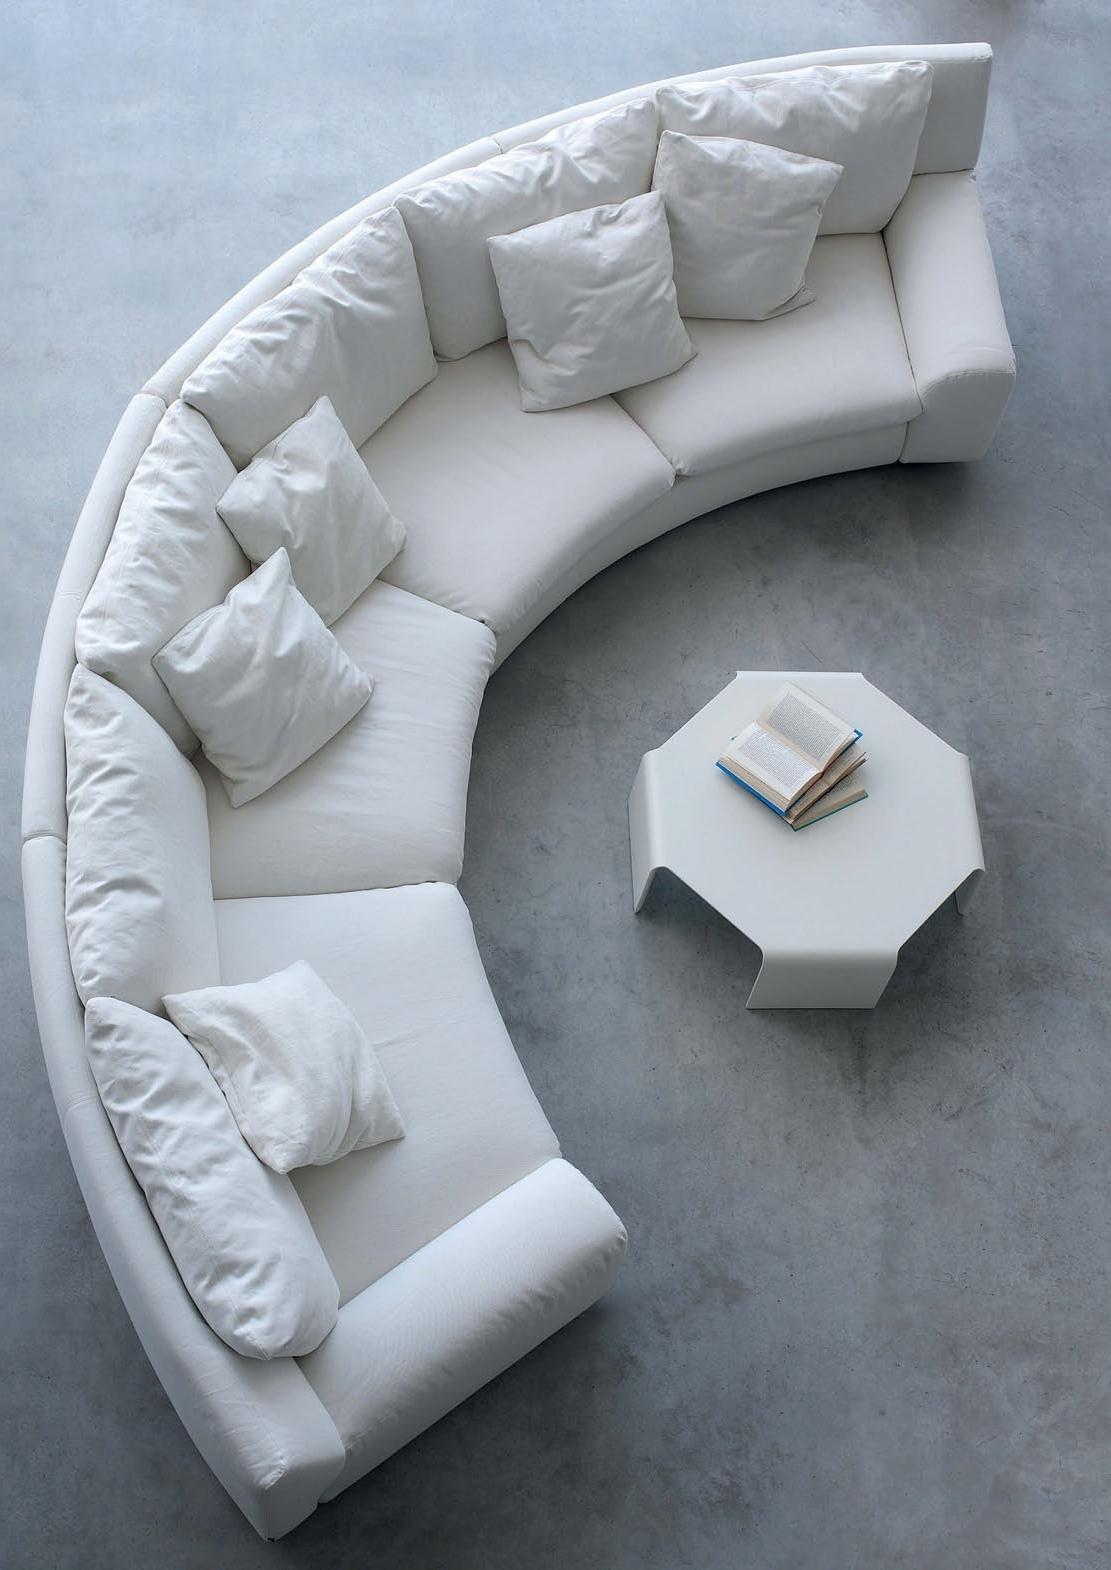 The Semicircular Sofa In Fabric Ben Ben, Arflex – Luxury Furniture Mr Within Fashionable Semicircular Sofas (View 10 of 20)